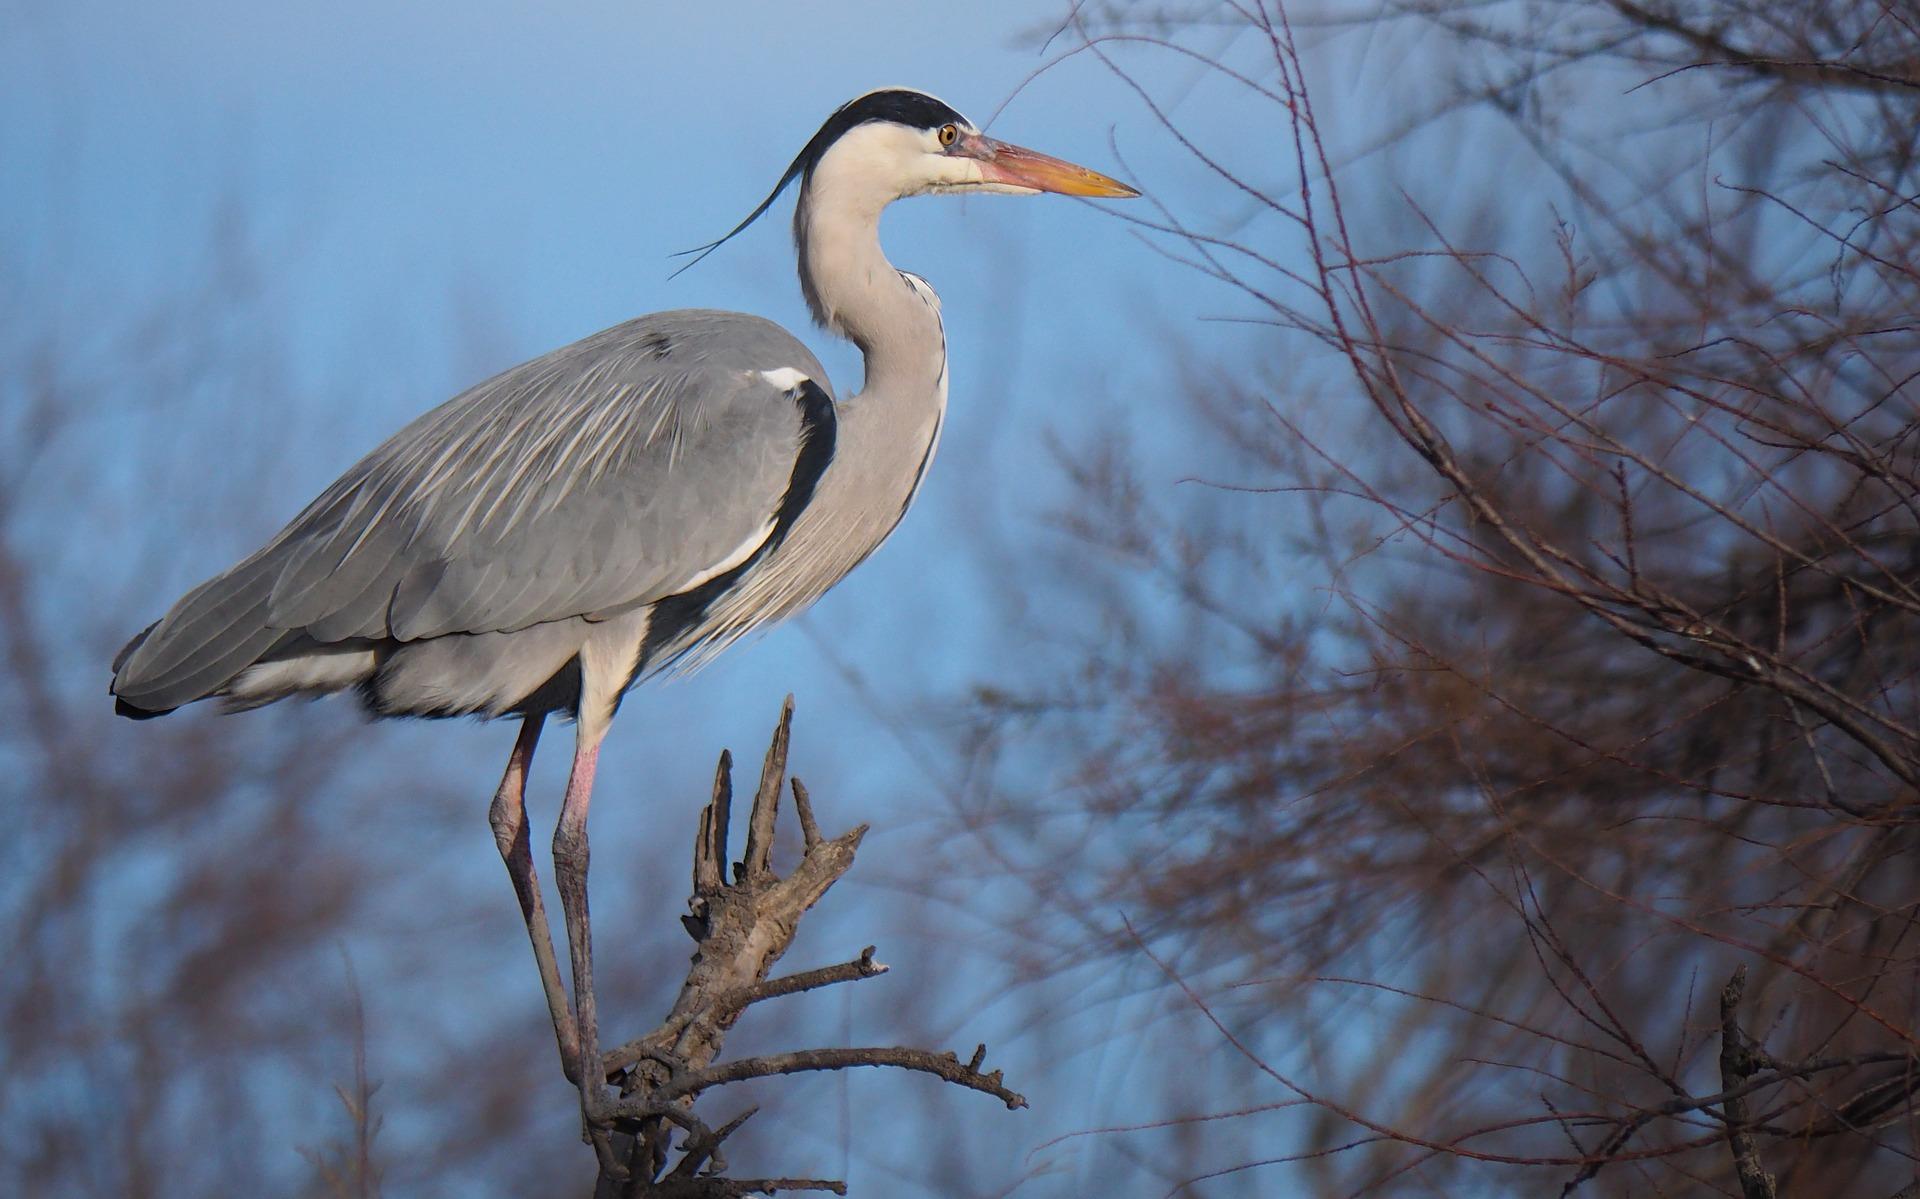 Heron art photography students Angel Oak